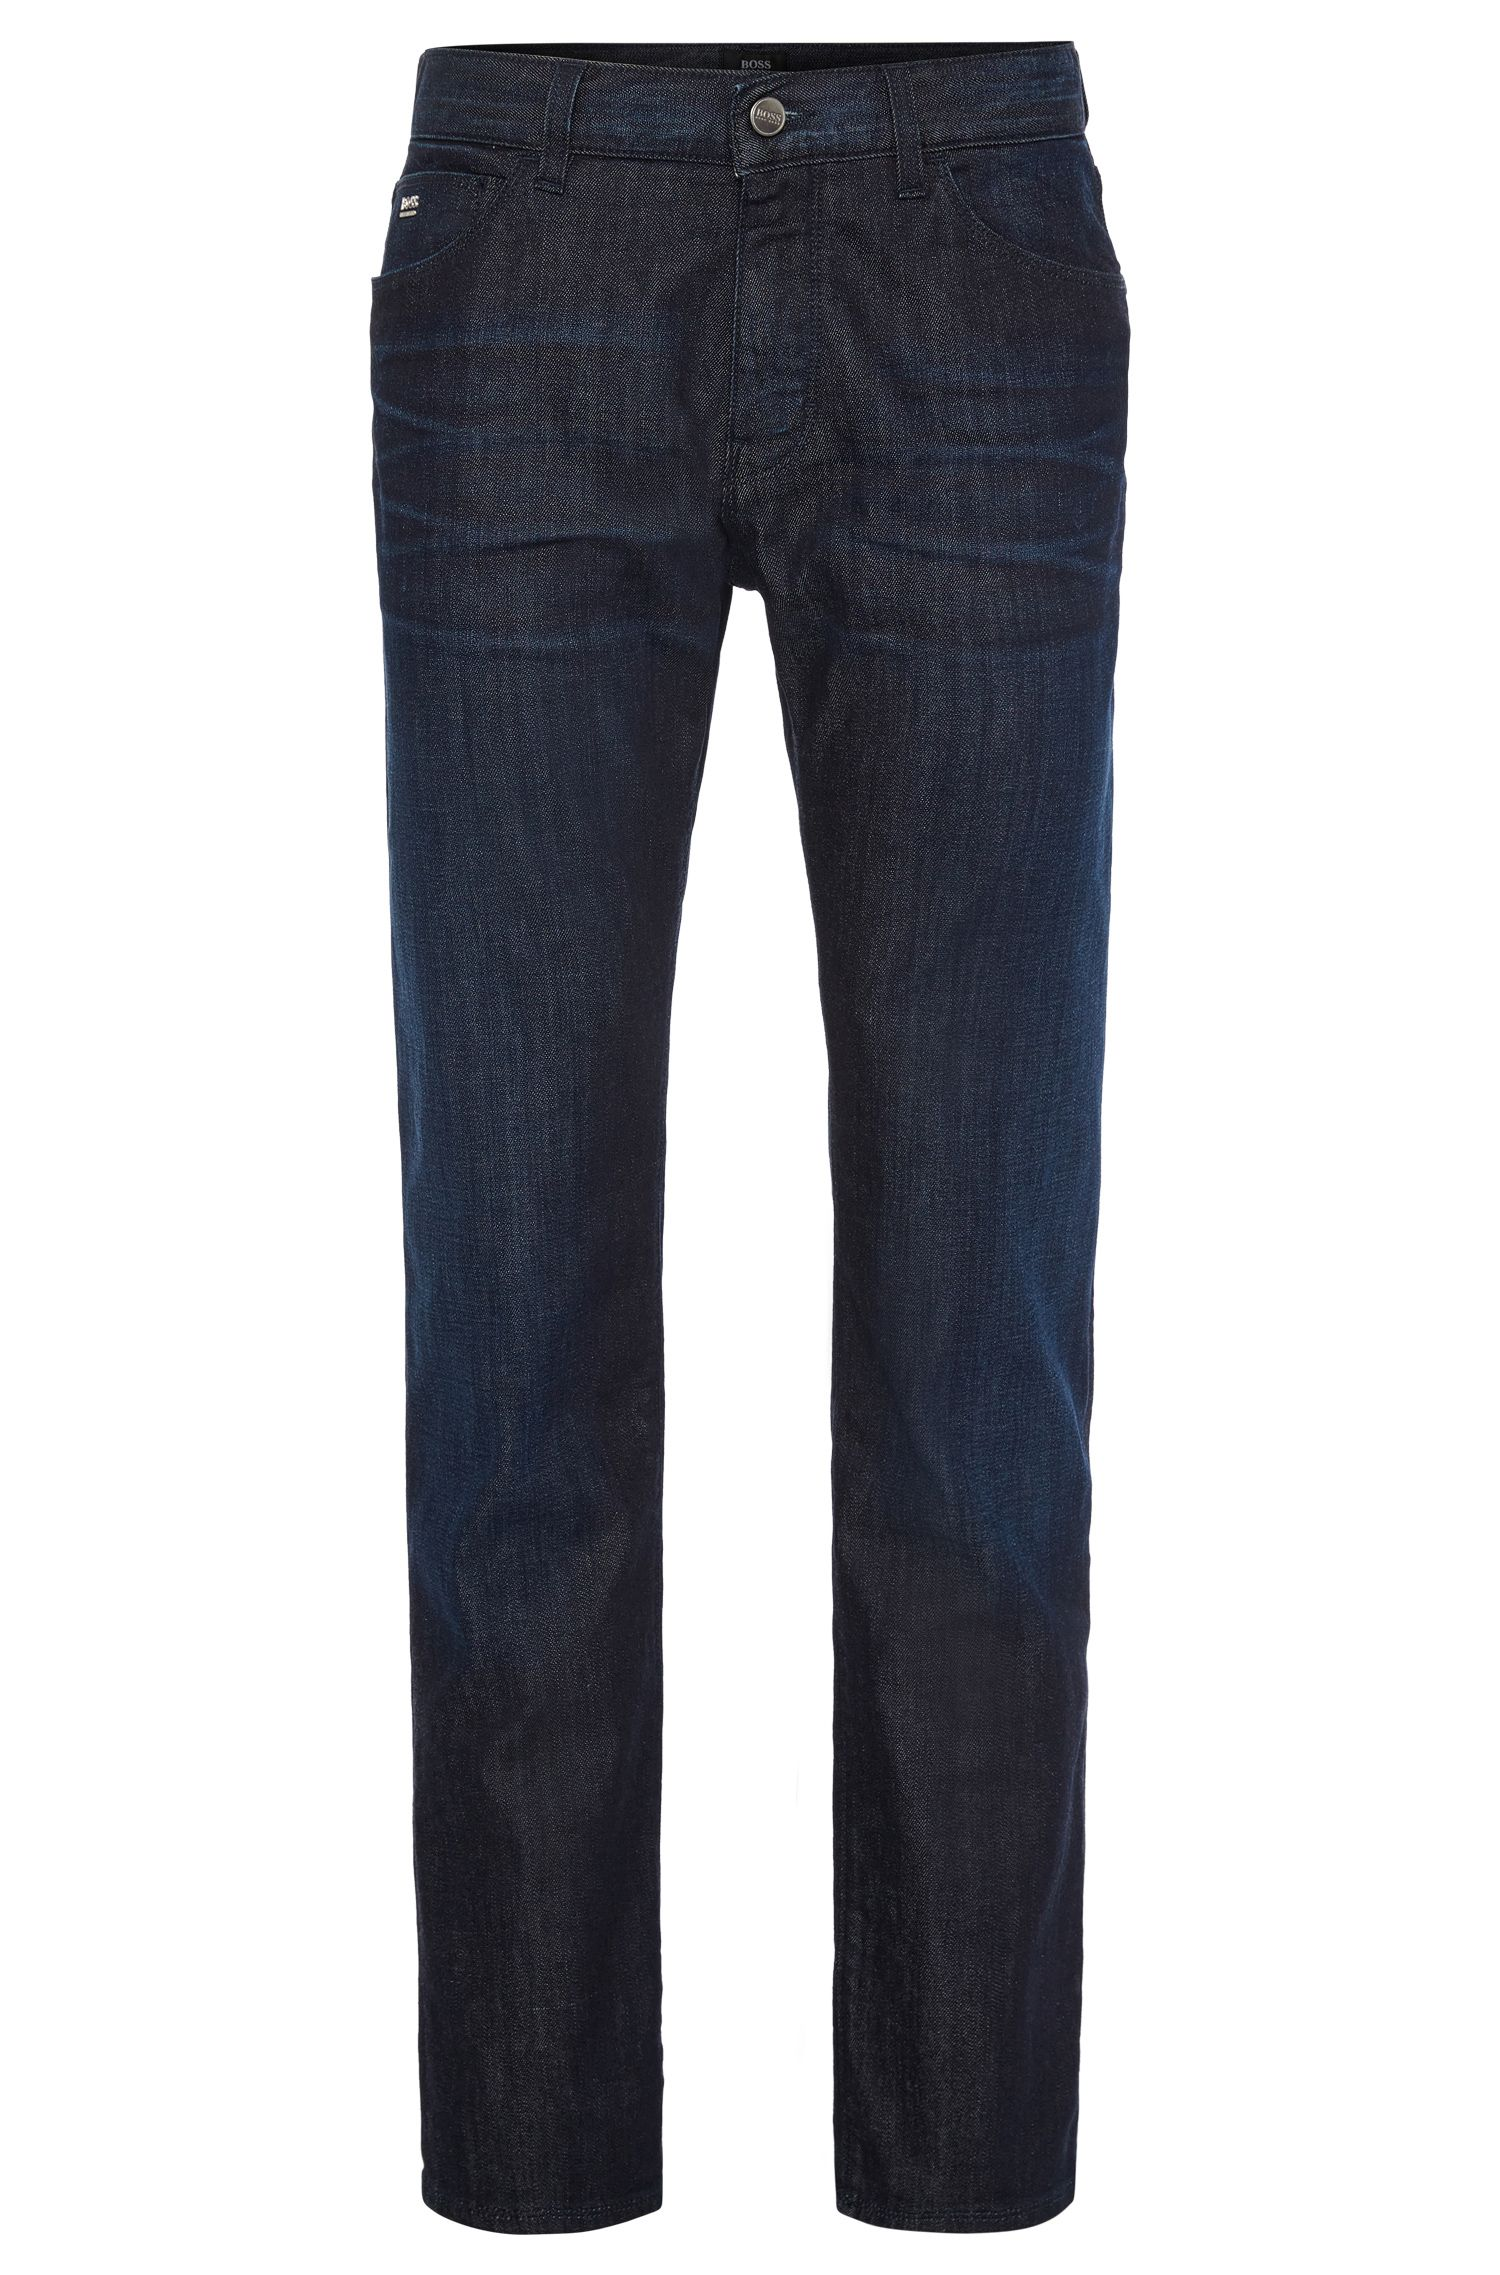 'Maine' | Regular Fit, 10 oz Stretch Cotton Jeans